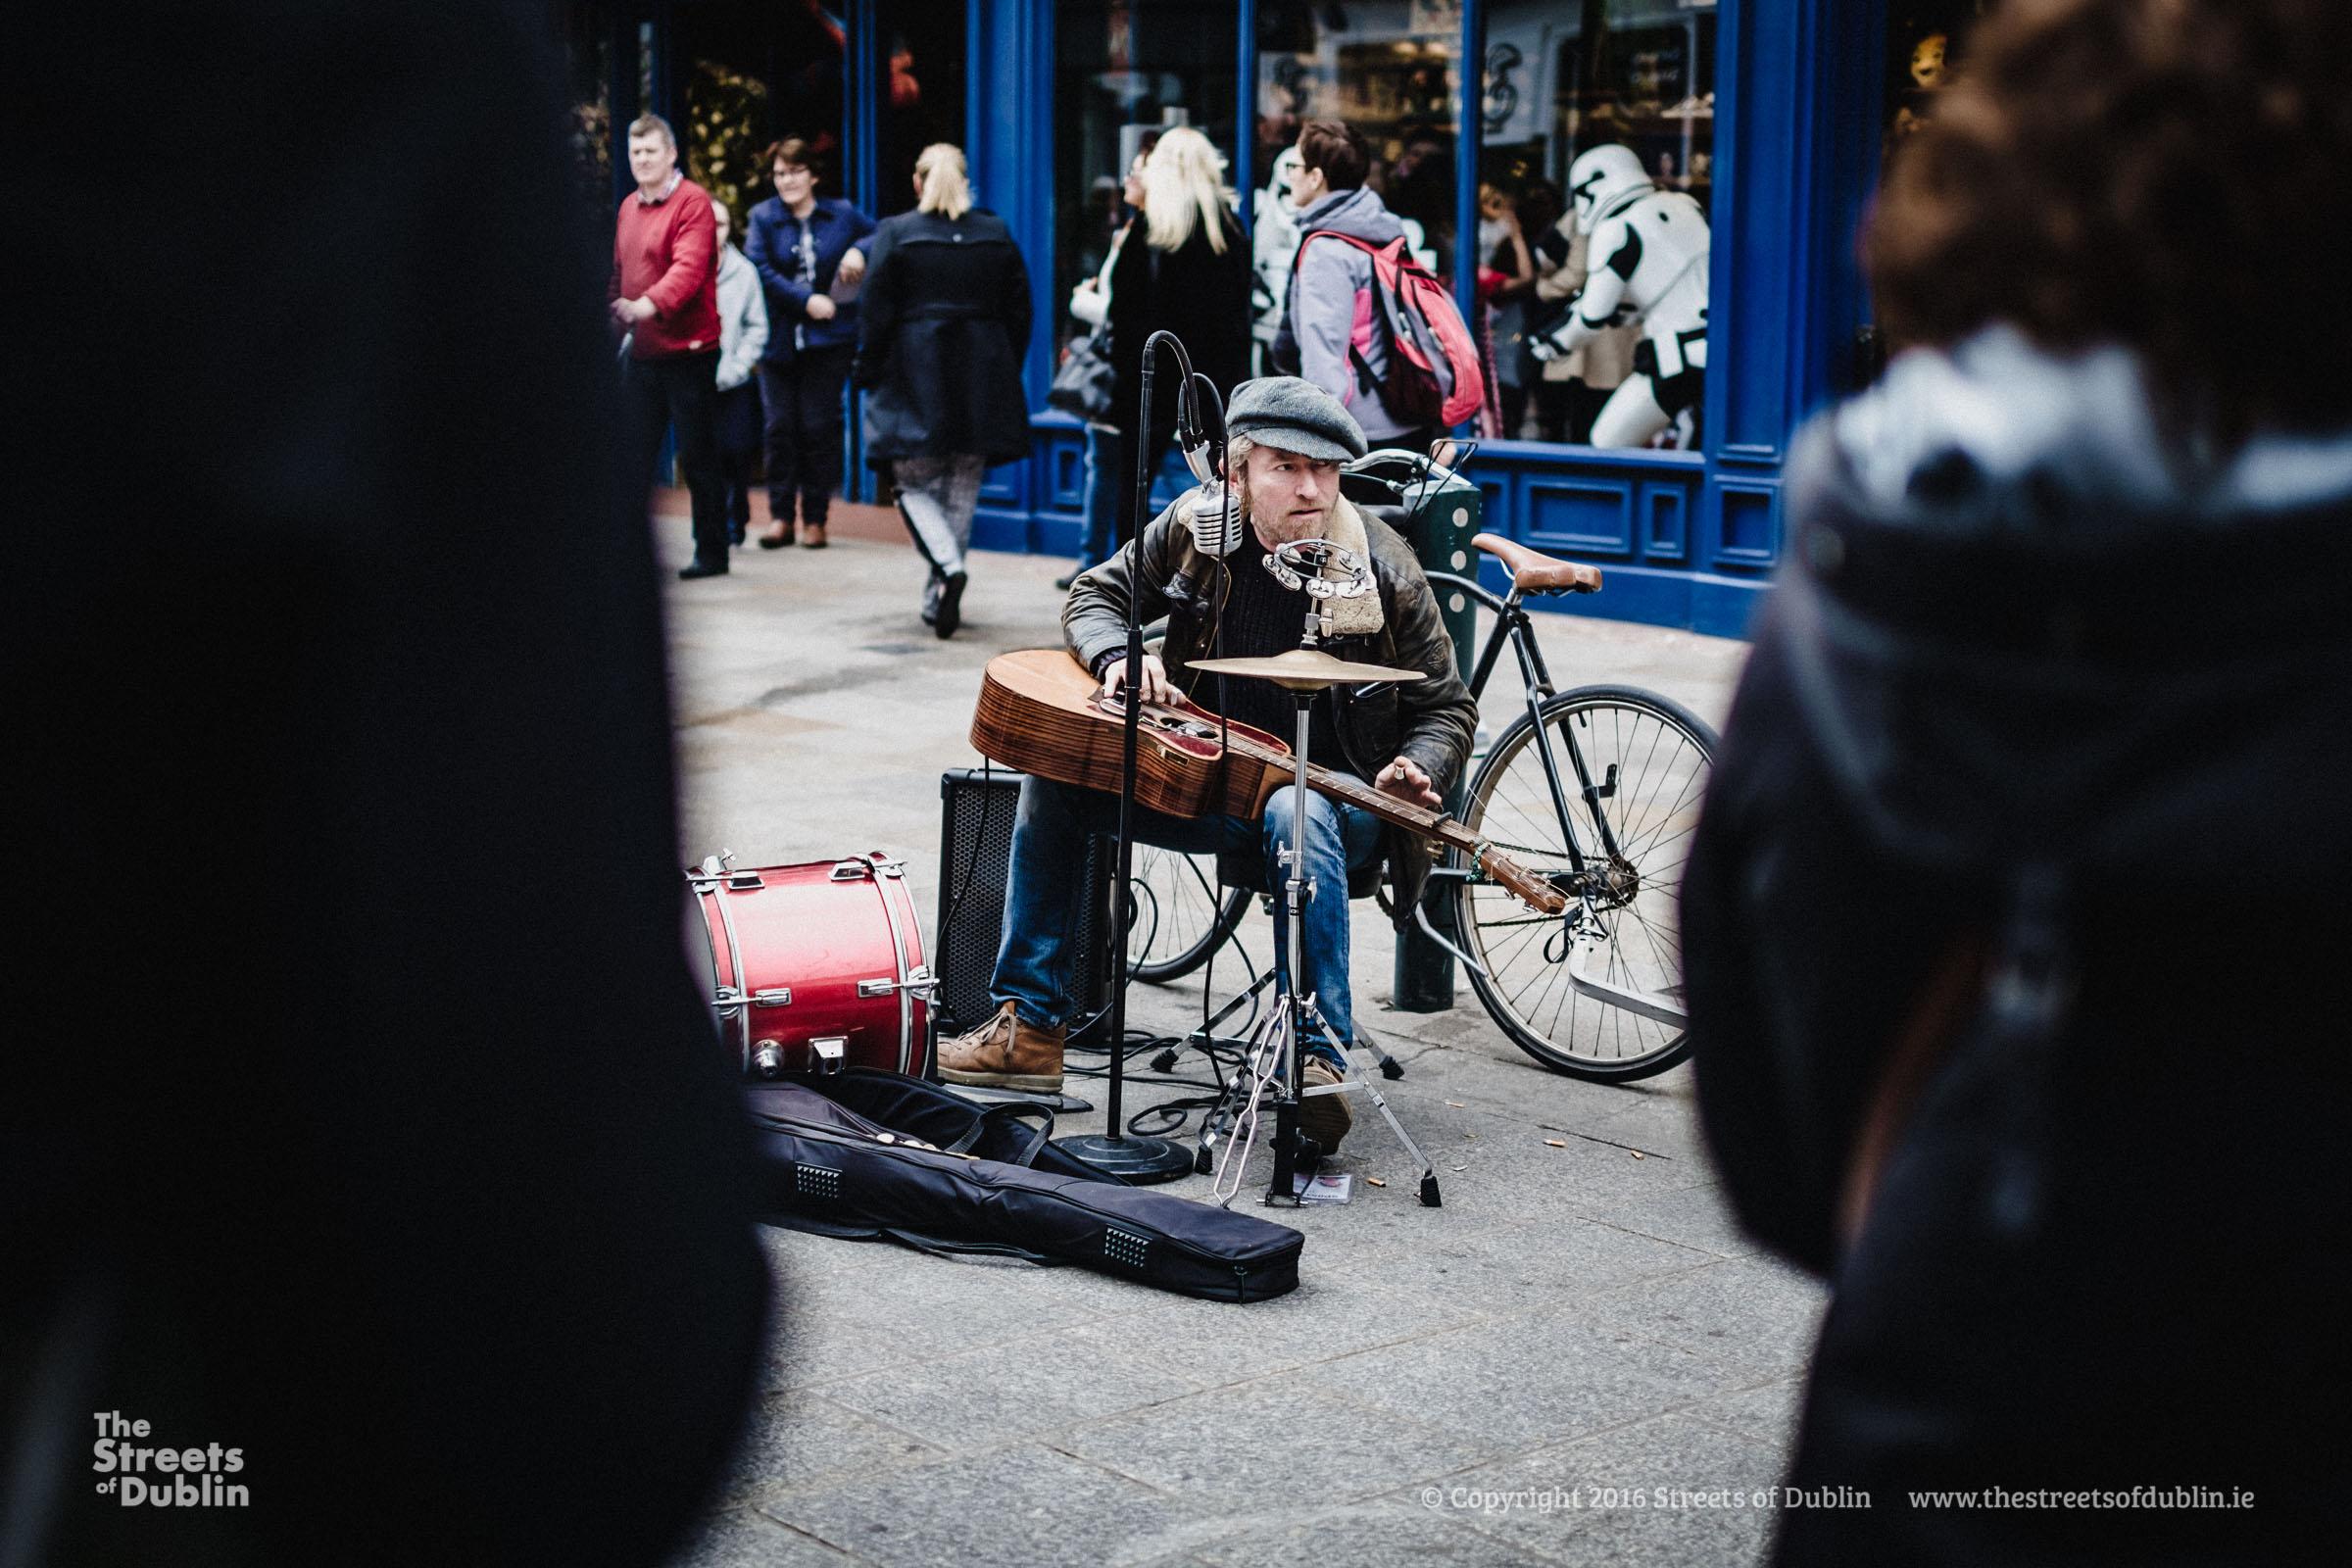 Streets-of-Dublin-Photo-2015.jpg